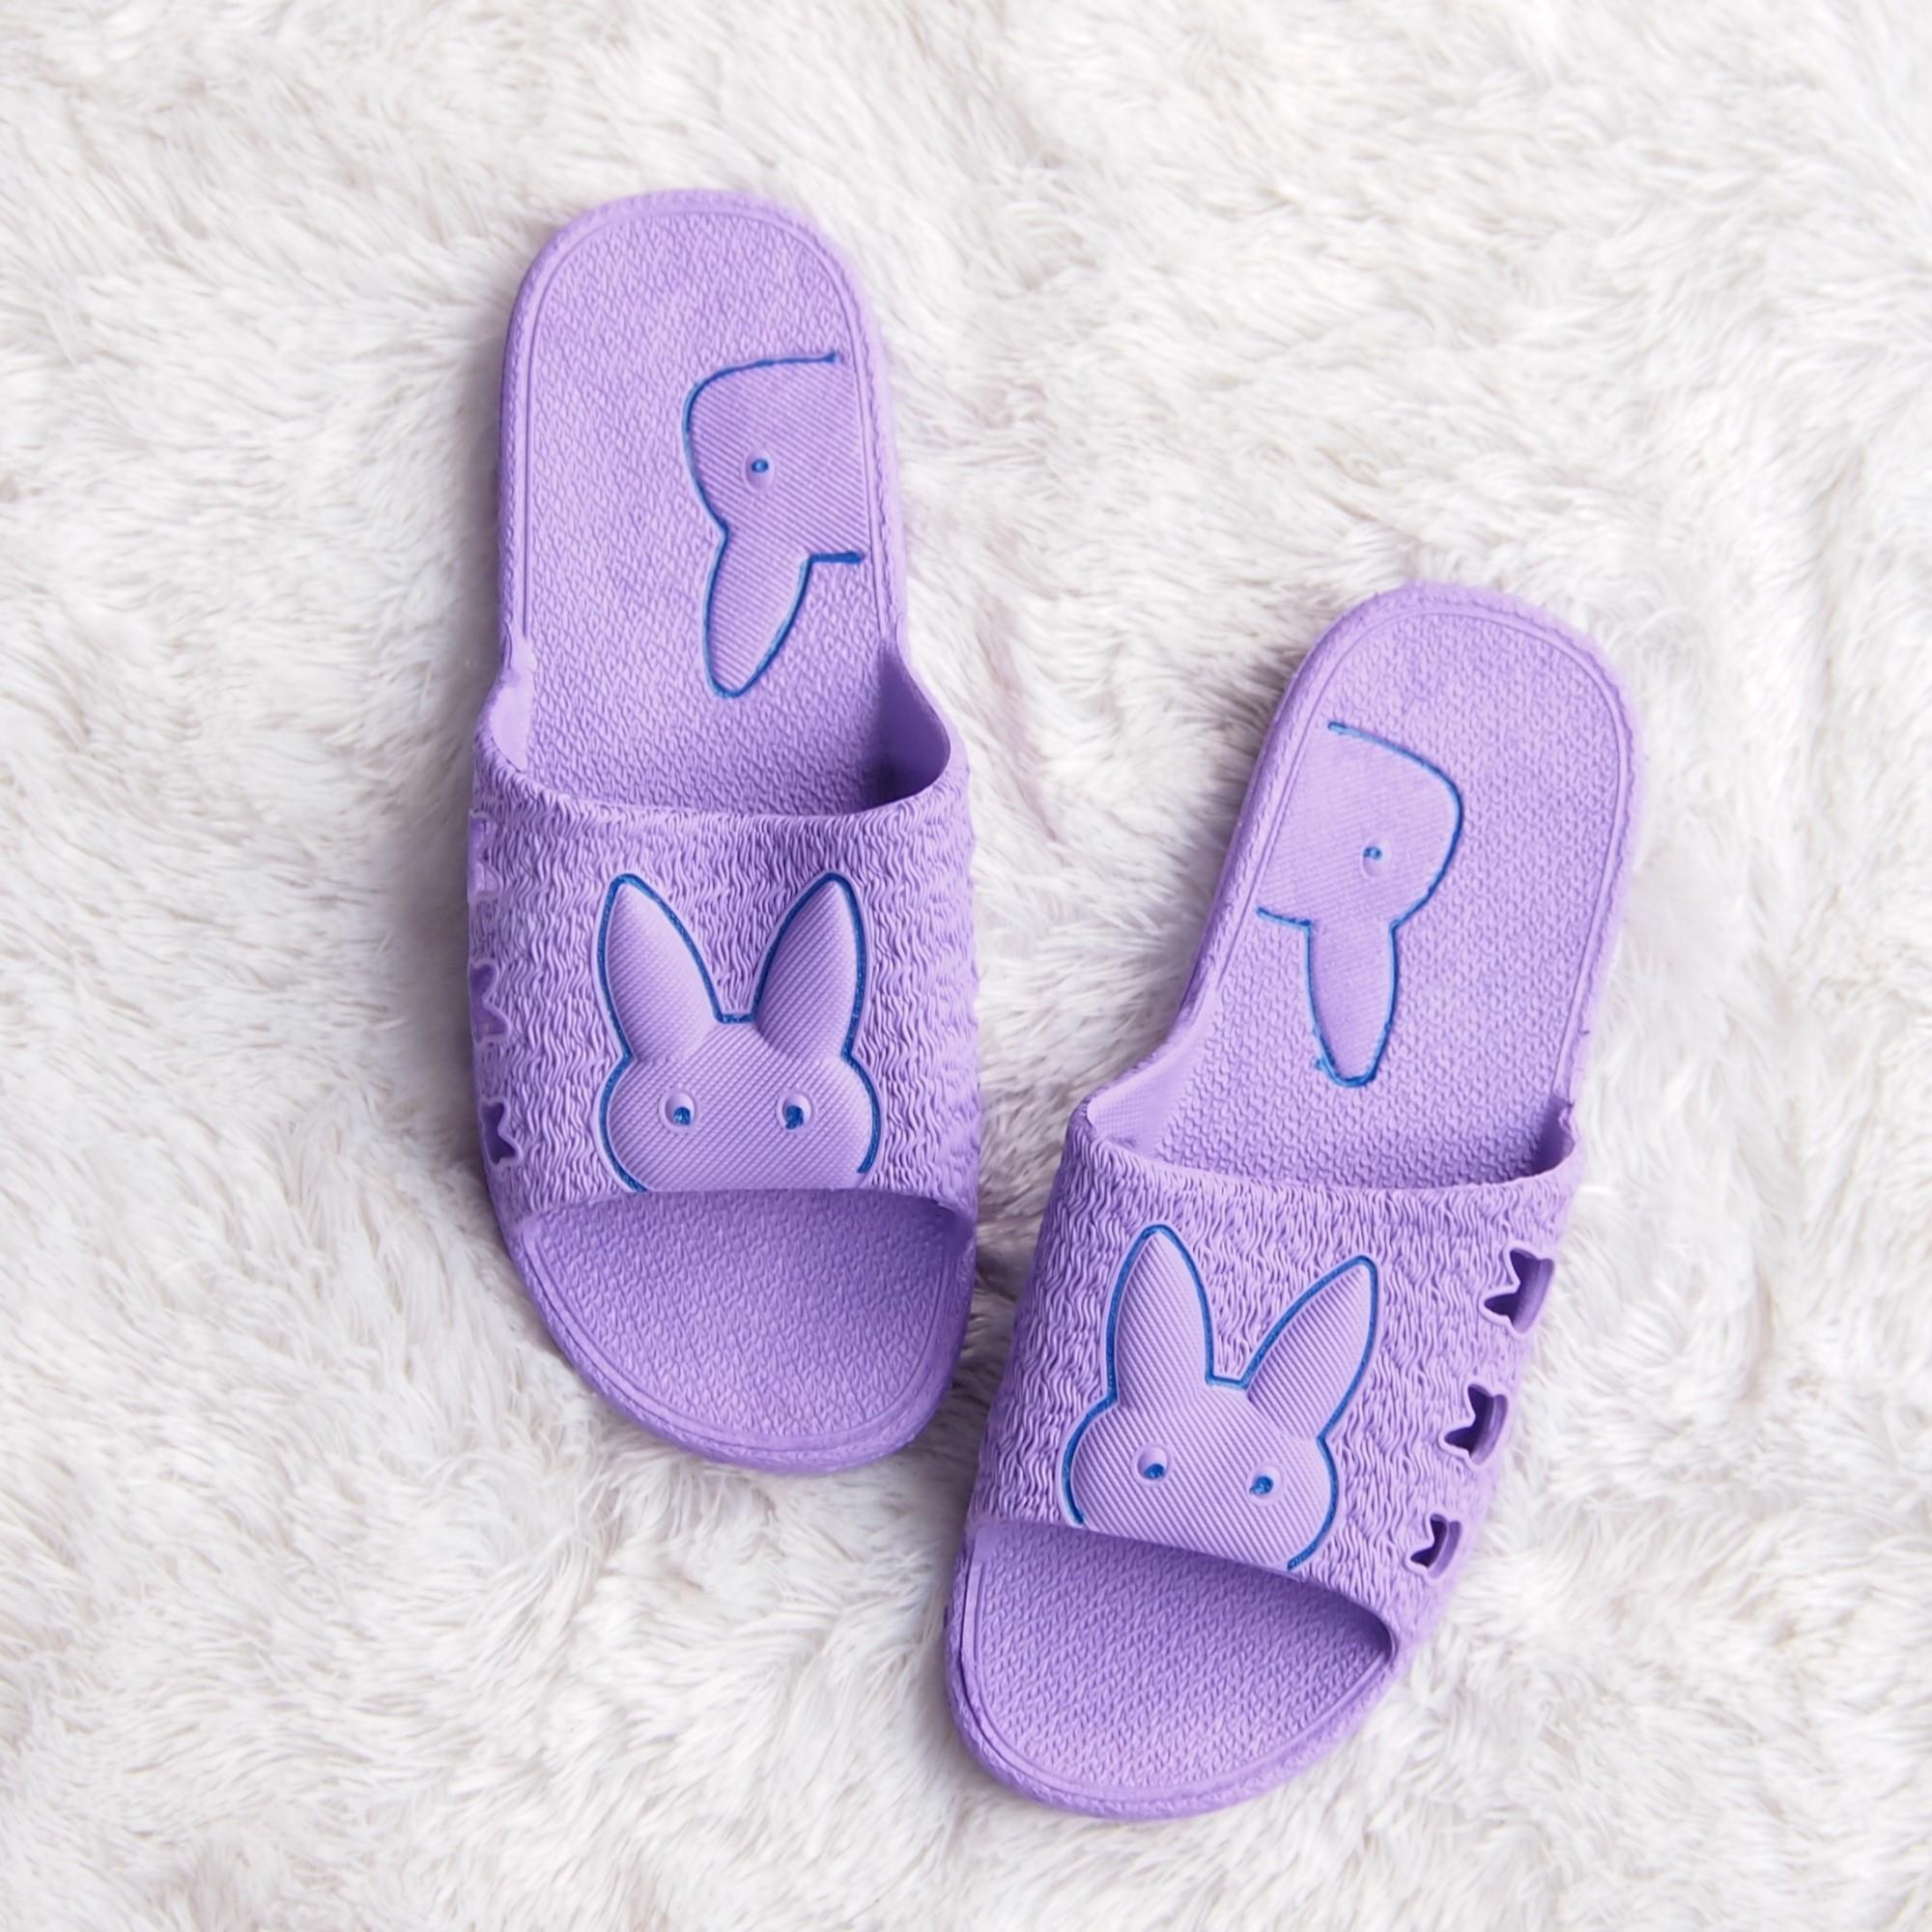 Sandal Jepit Wanita Terbaru Ando Surfer Girl Sepatu Sendal Anak Free Shipping Jabodetabek Termurah Best Bunny Anti Licin Jelly Euk90